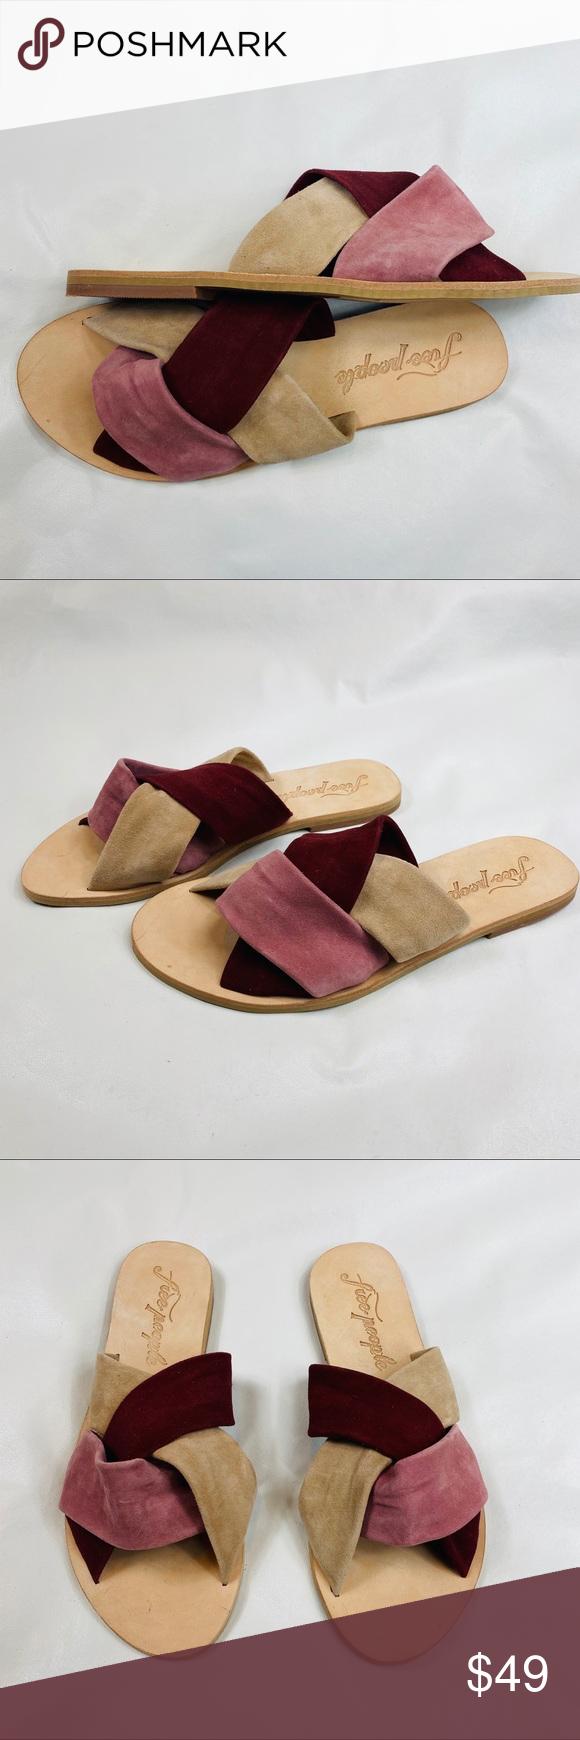 New Free People Rio Vista Slide Sandal Free People Shoes Sandals Slide Sandals Women S Shoes Sandals